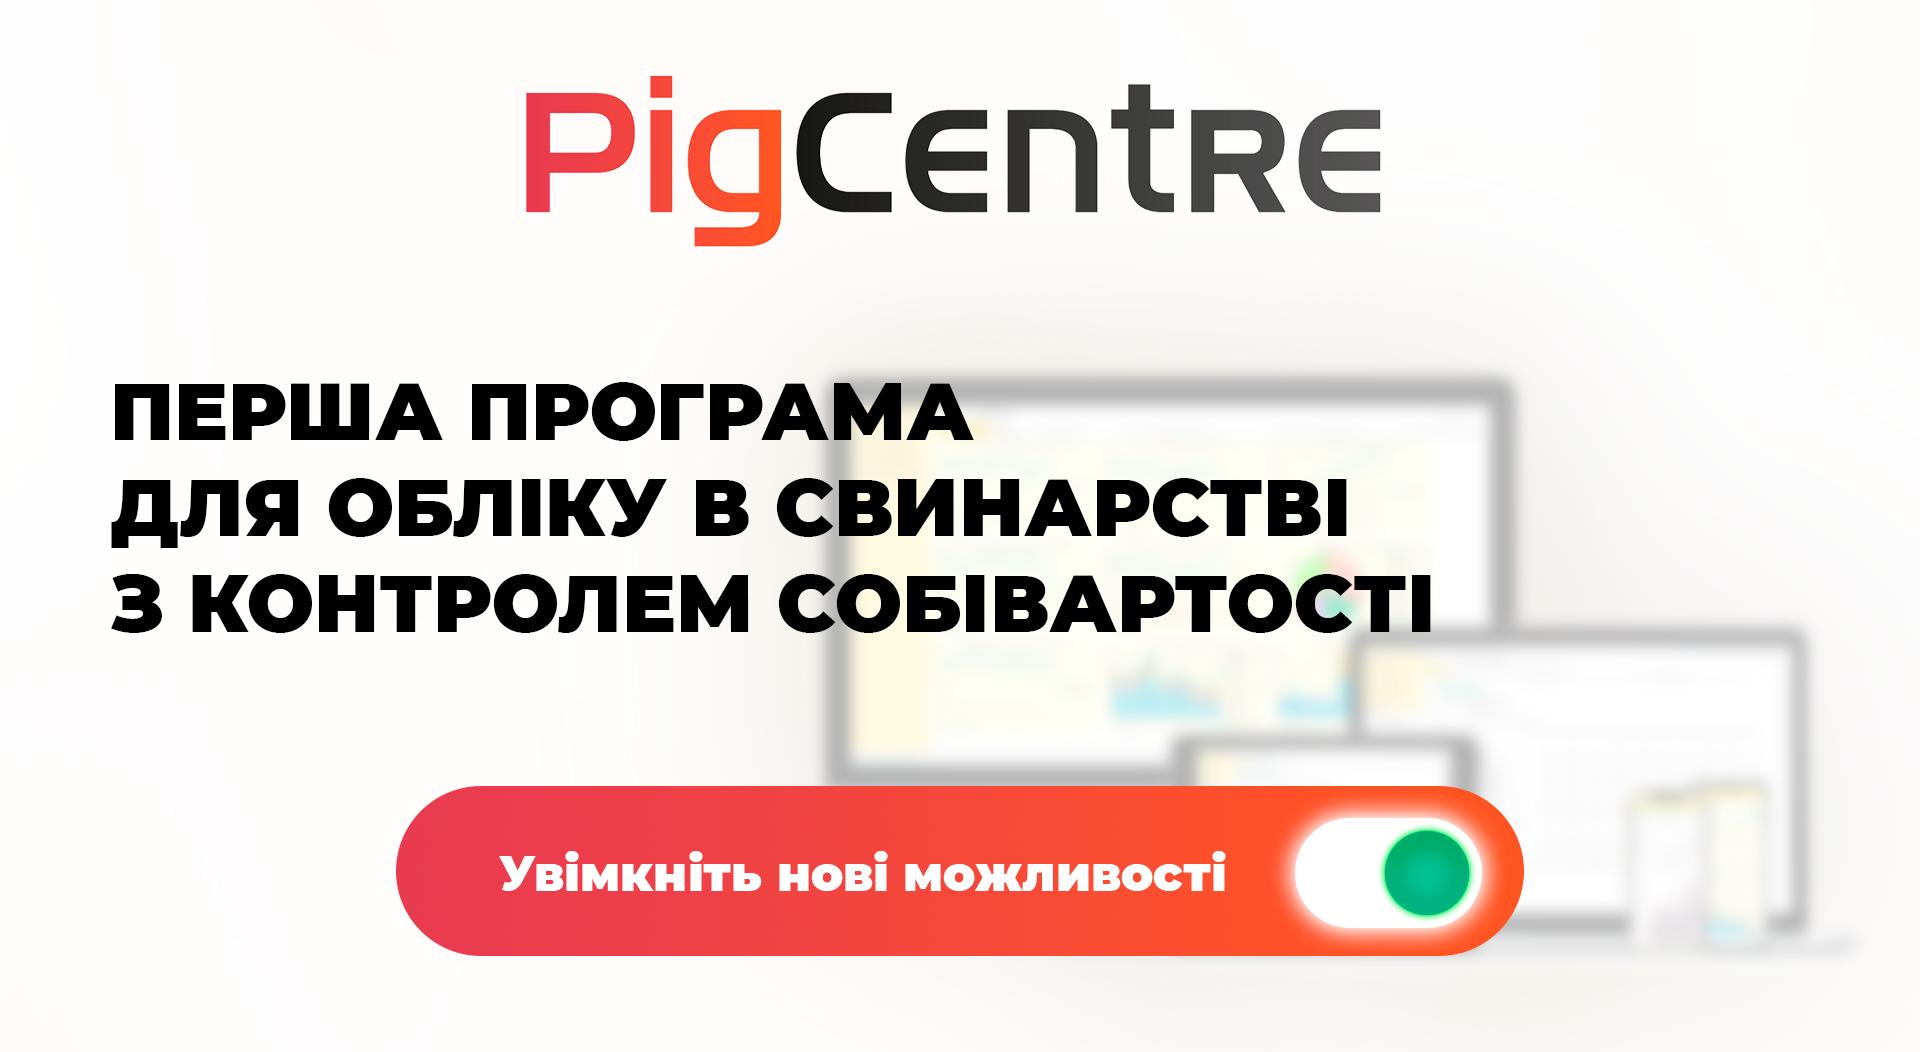 pigcentre